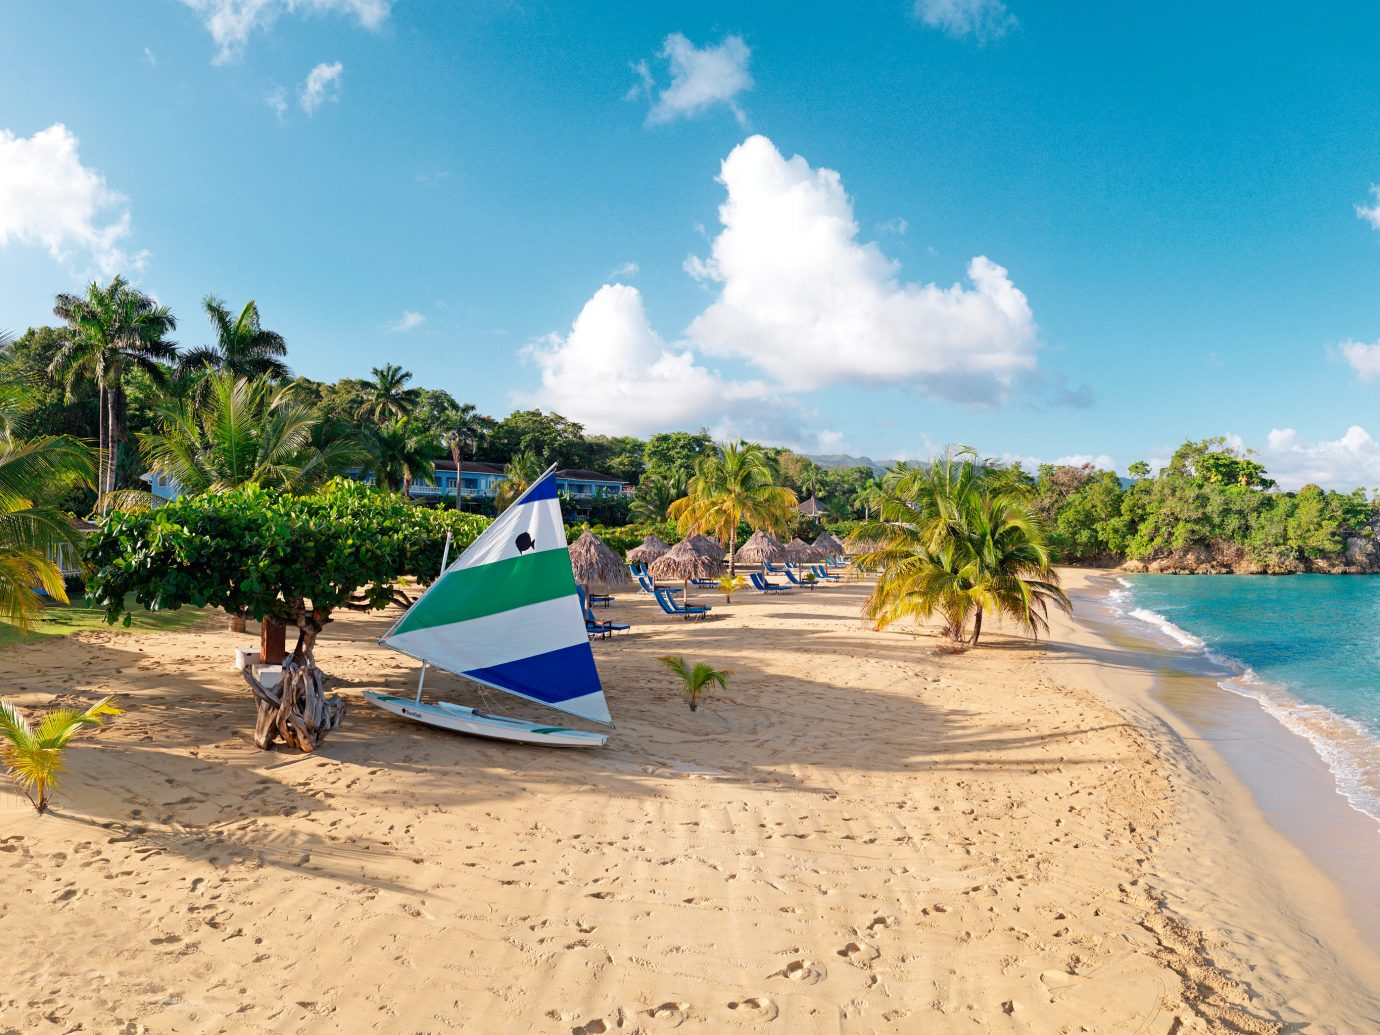 Adventure Beach Beachfront Luxury Ocean Outdoors Resort sky water ground shore leisure caribbean Sea Coast Nature tropics Island Lagoon cape sand arecales cove sunny day sandy